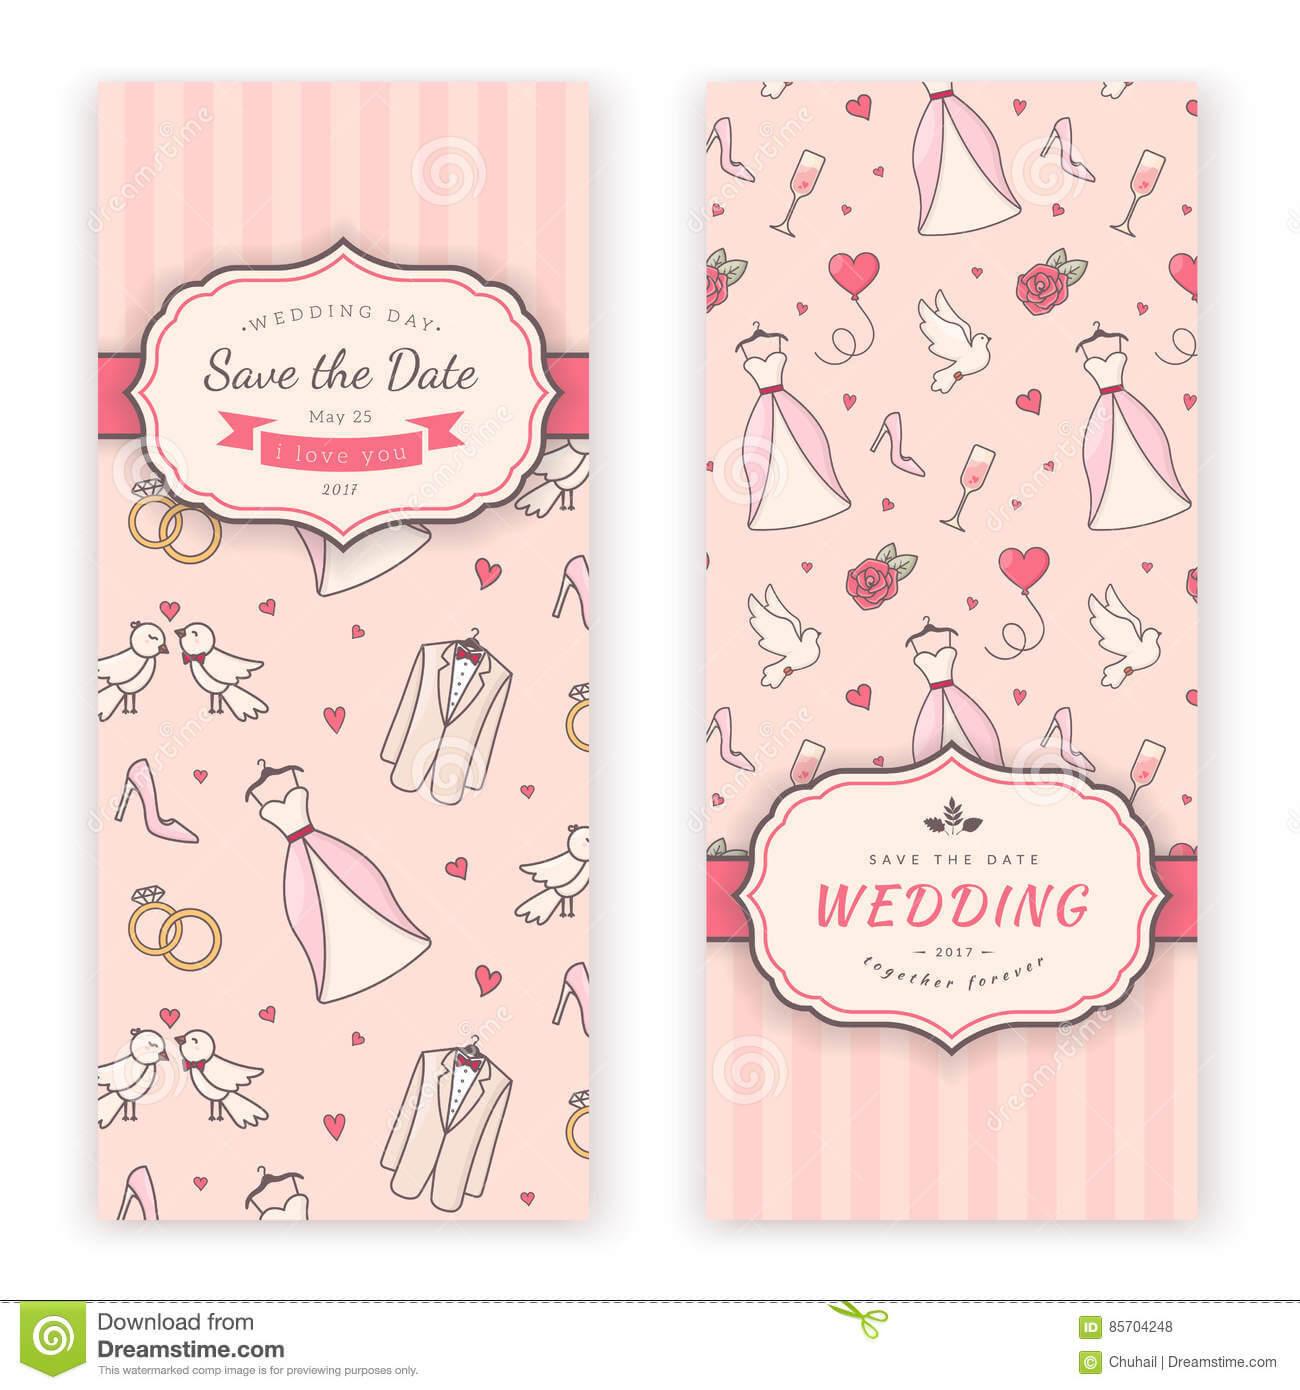 Wedding Banner Template. Stock Vector. Illustration Of Love Pertaining To Wedding Banner Design Templates